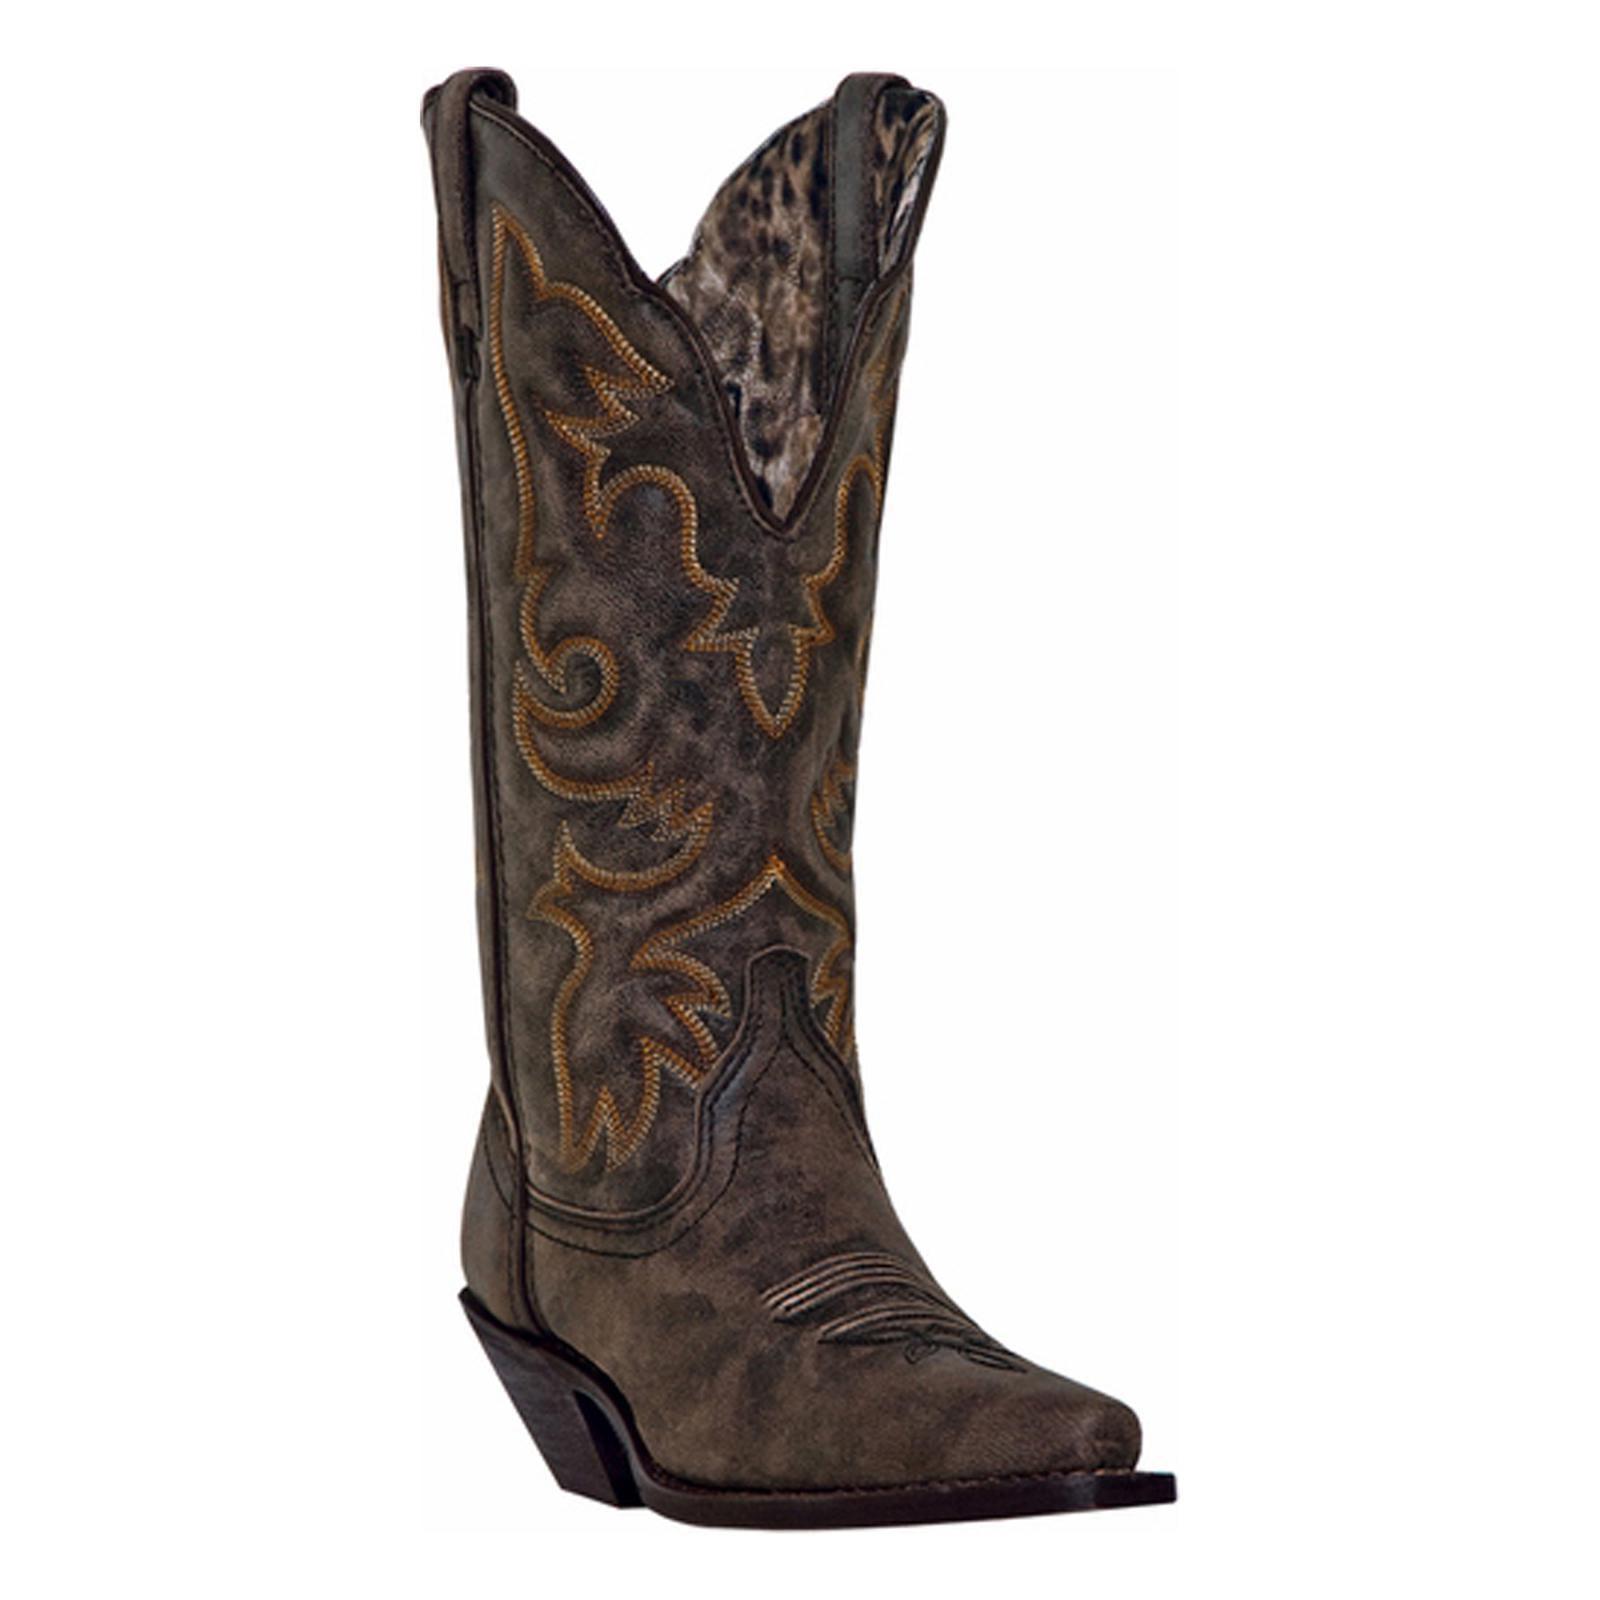 "Laredo Western Boots Womens 12"" Stitched Cowboy Access Black Tan 51079 by Laredo"